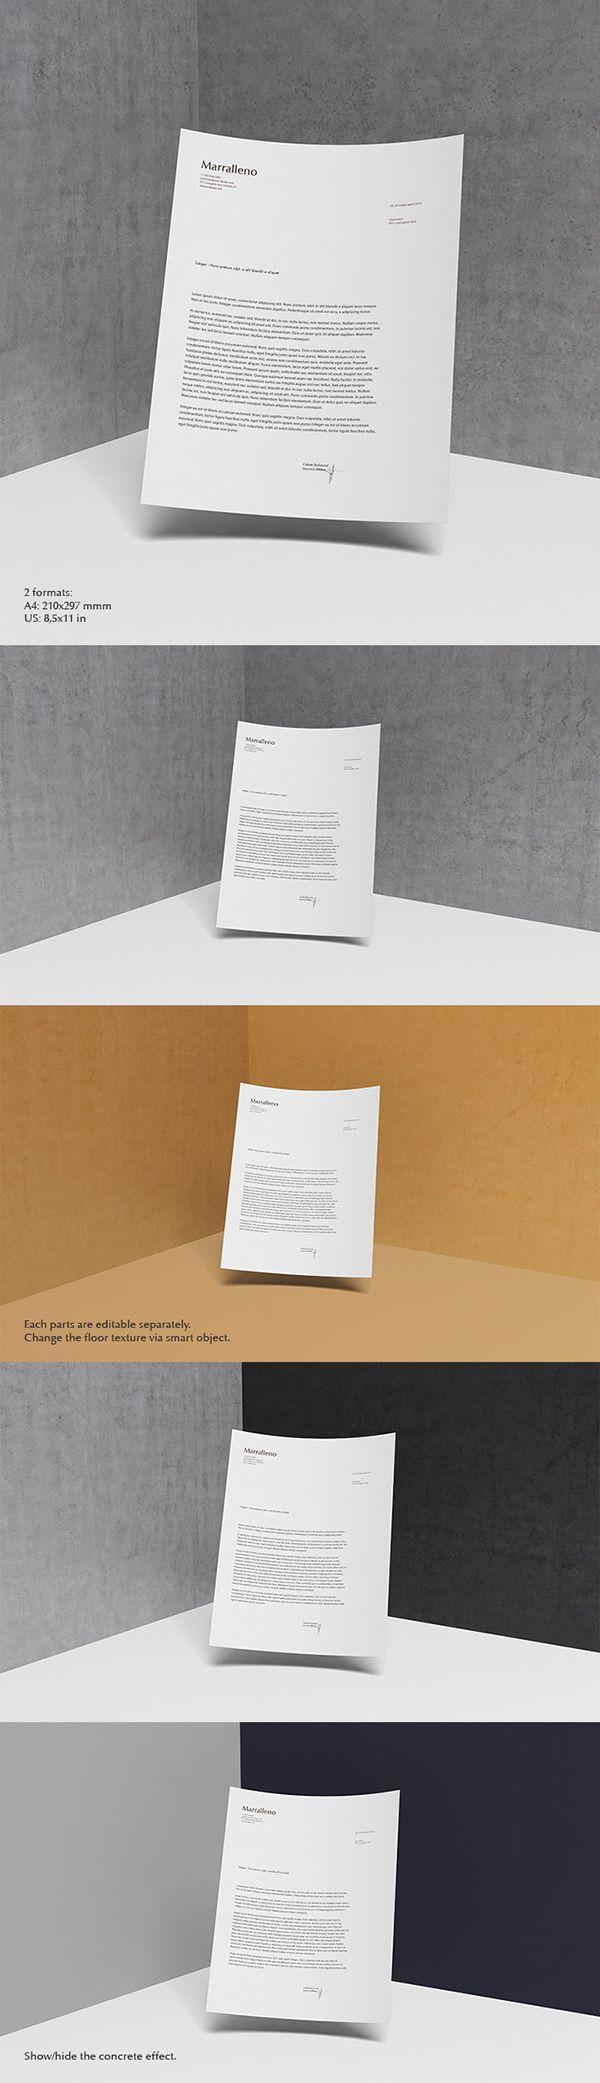 Letterhead MockUp PSD | GraphicBurger